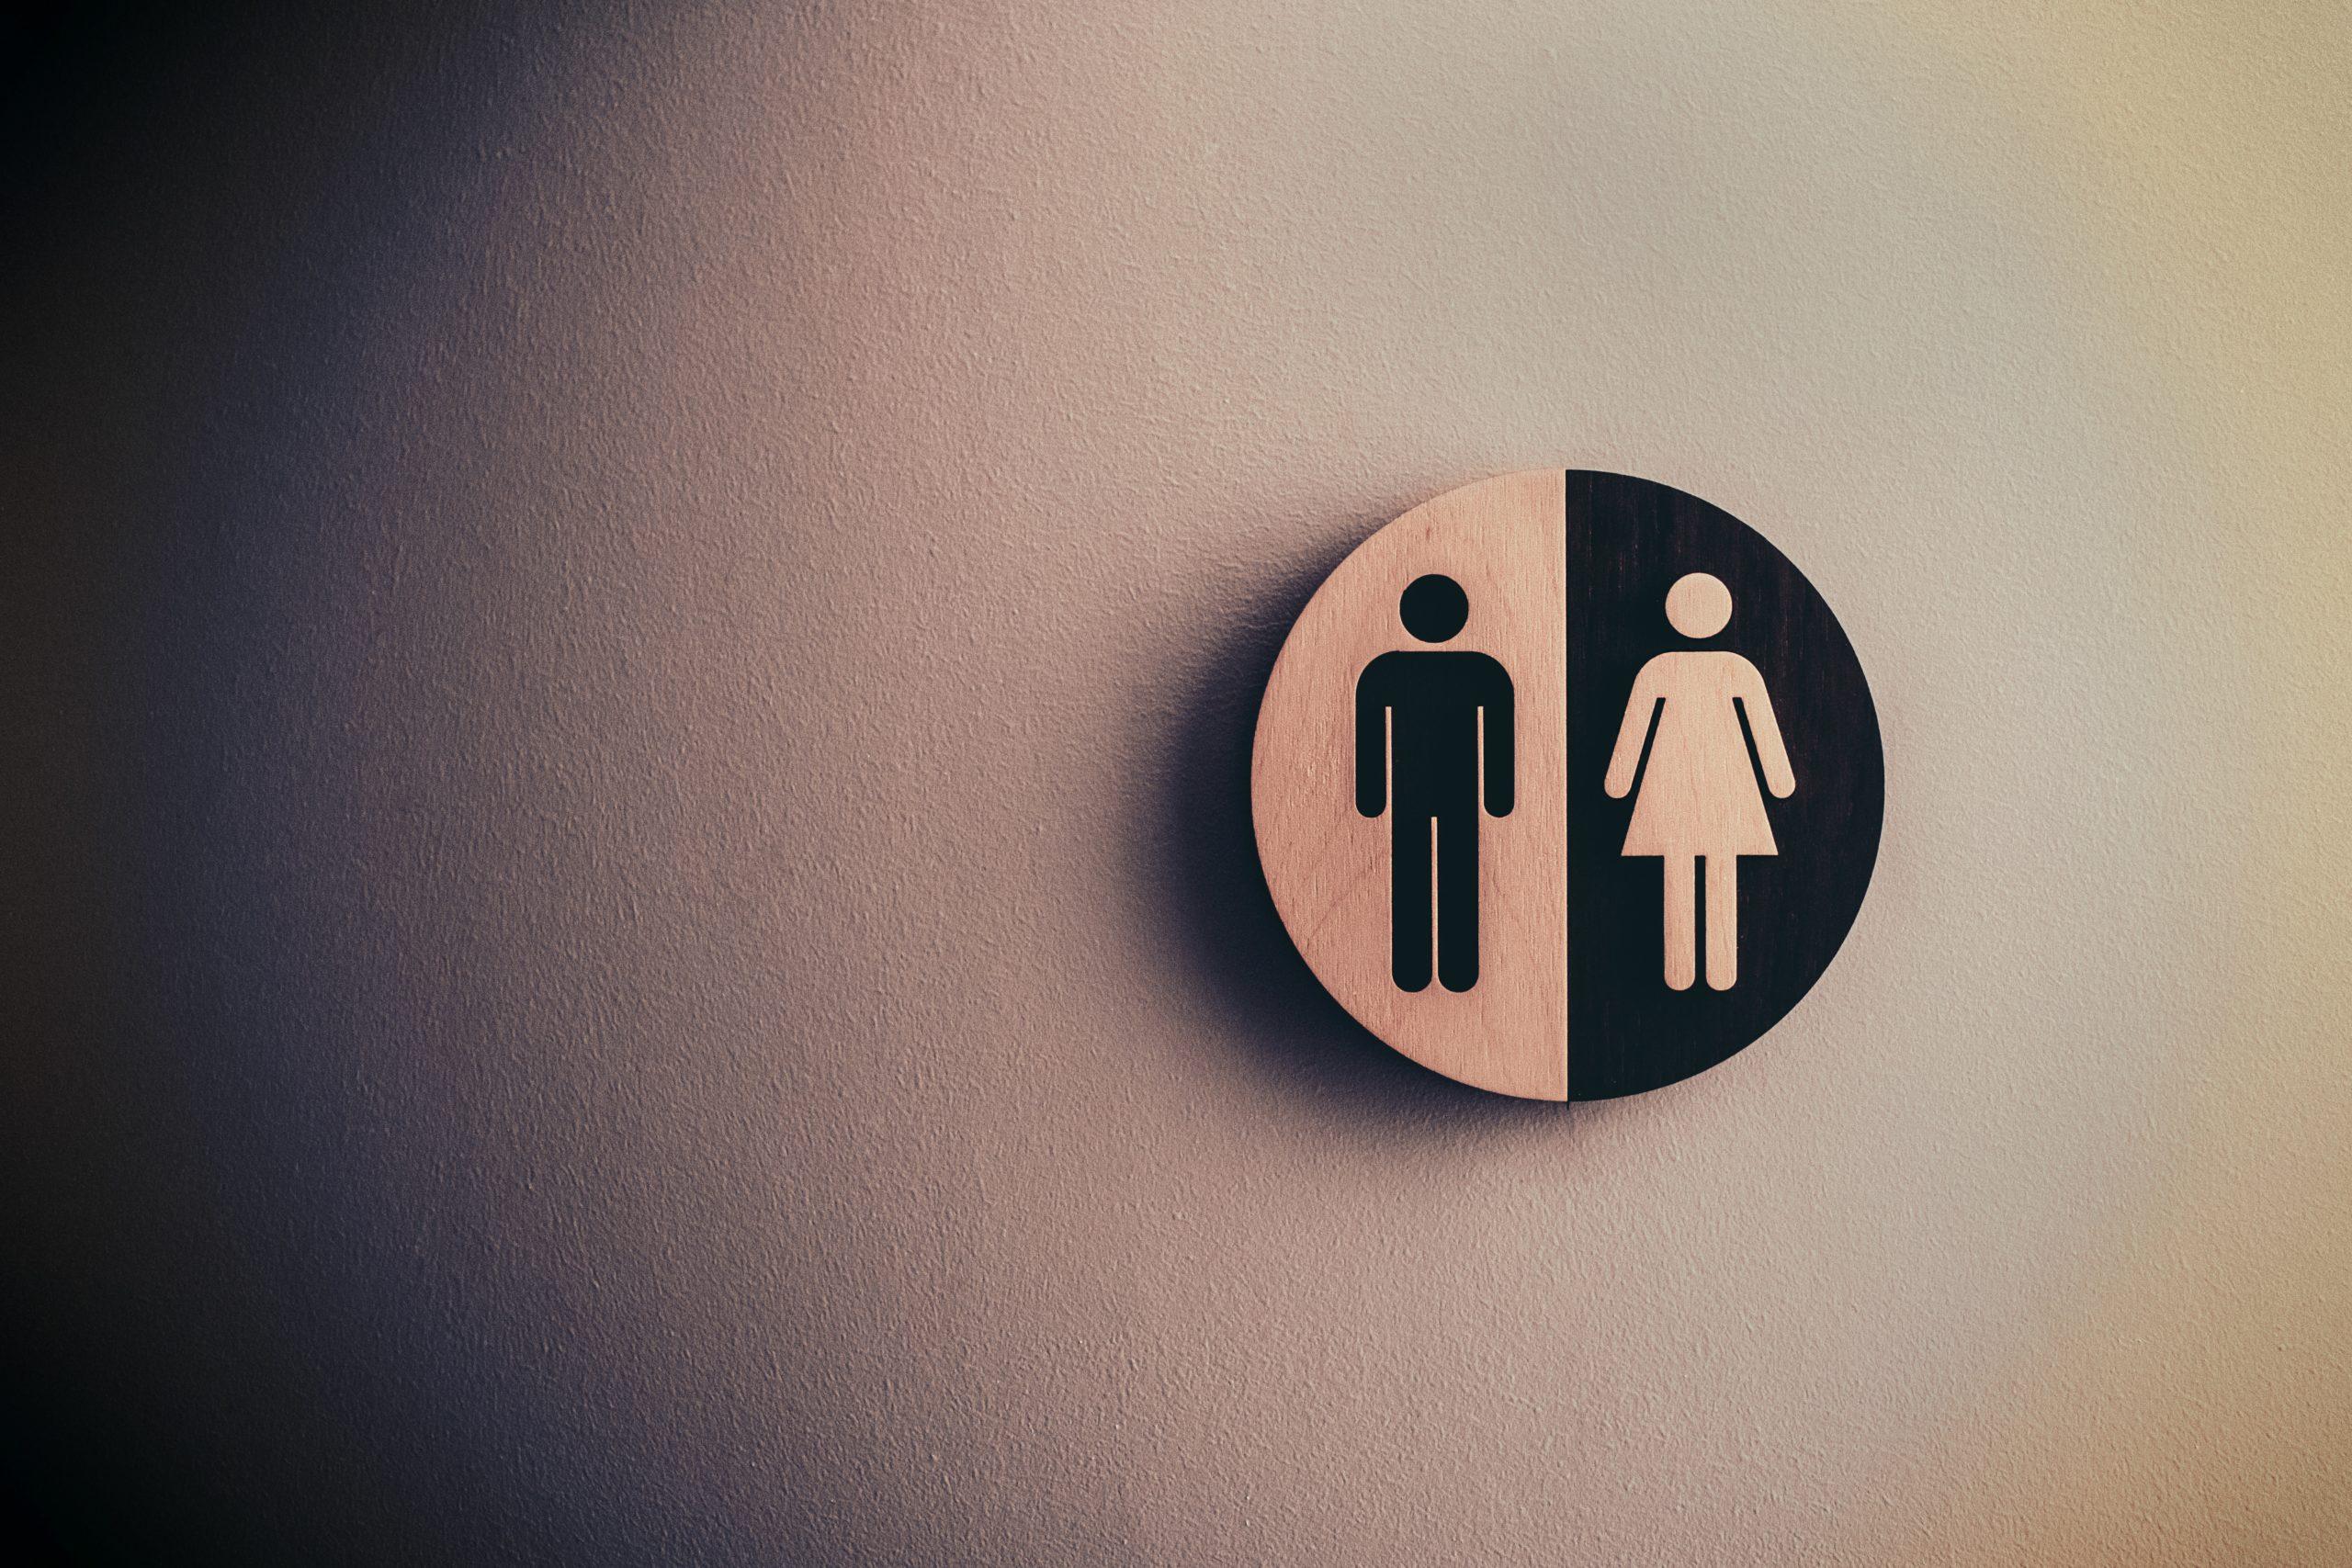 Toilets Around the World